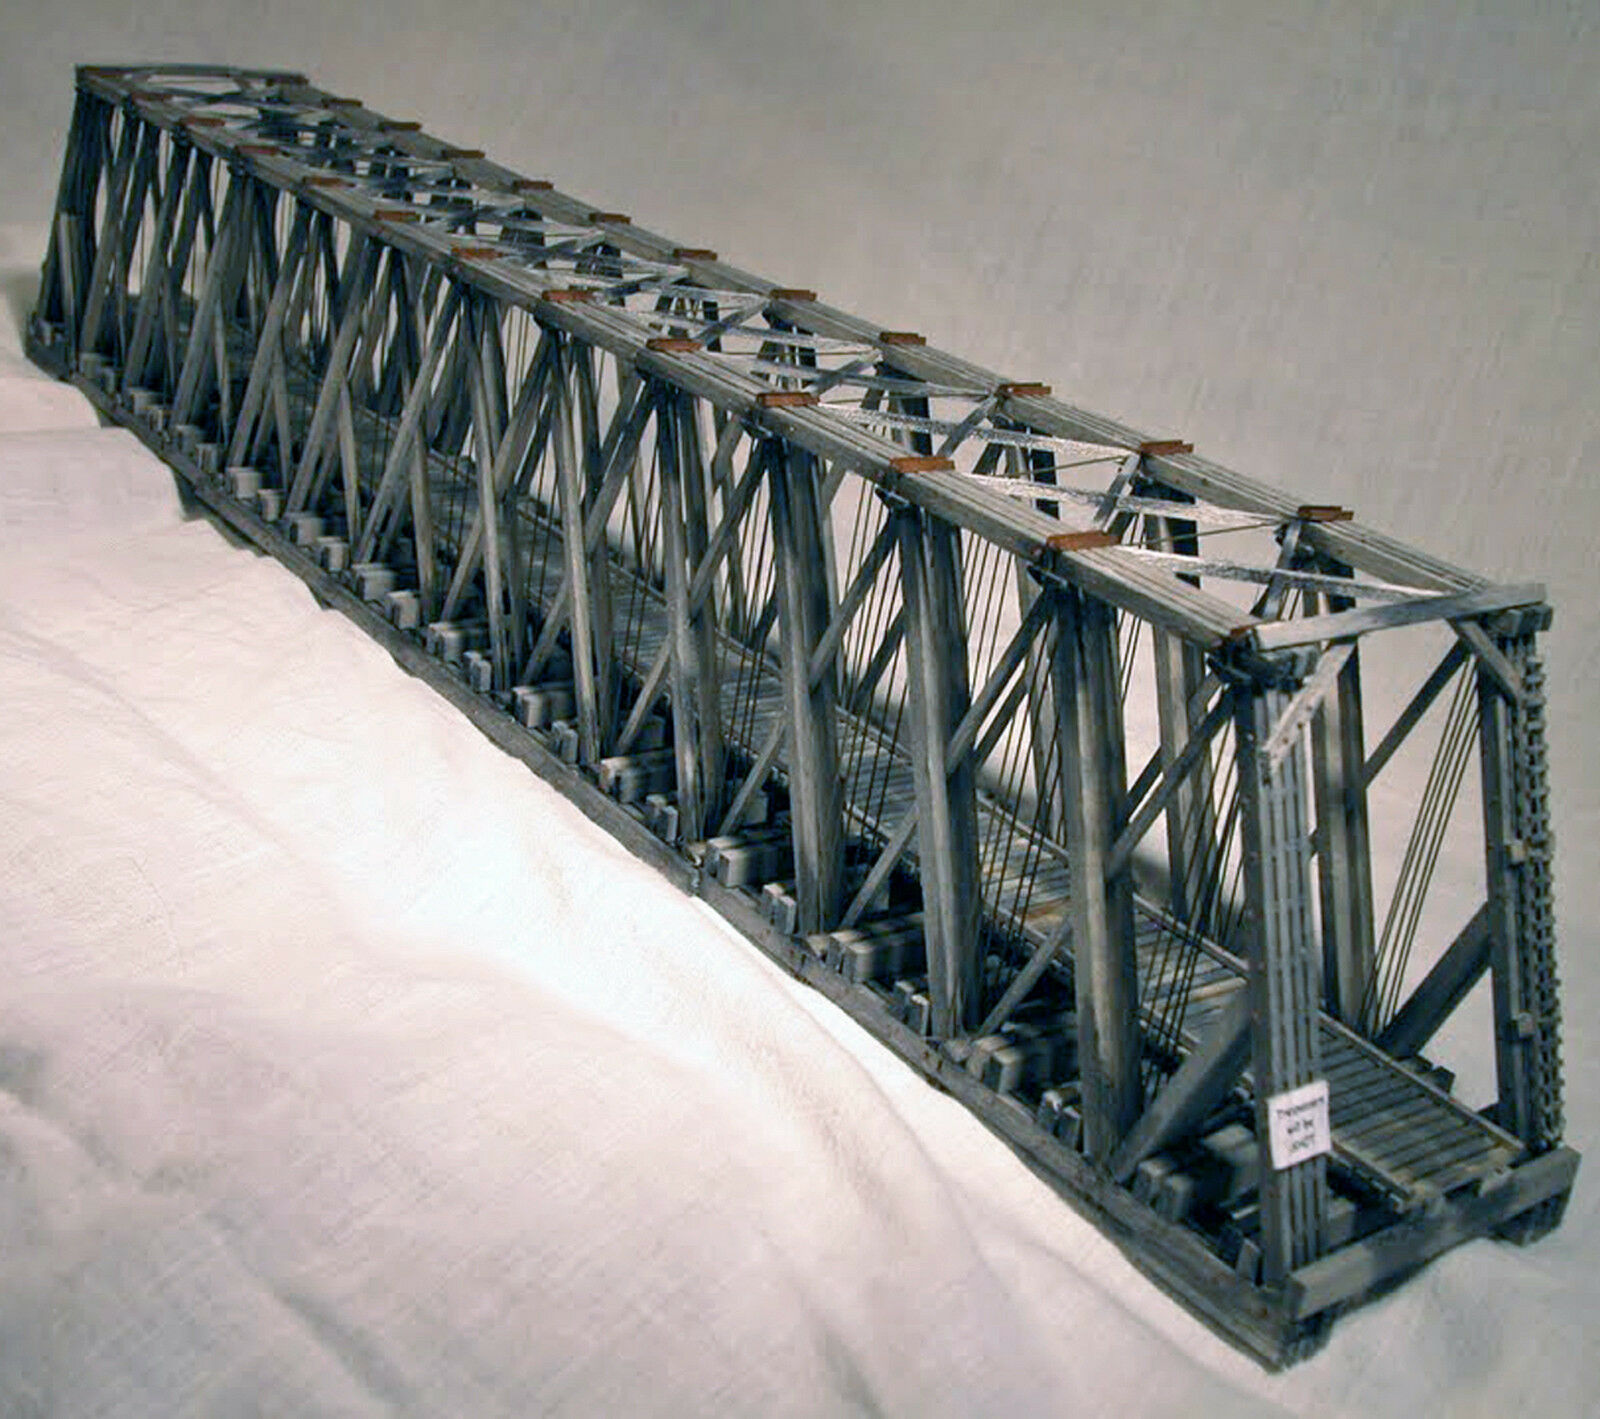 170' HO puente Howe Truss a través de estructura de ferrocarril modelo HL104H kit de artesano